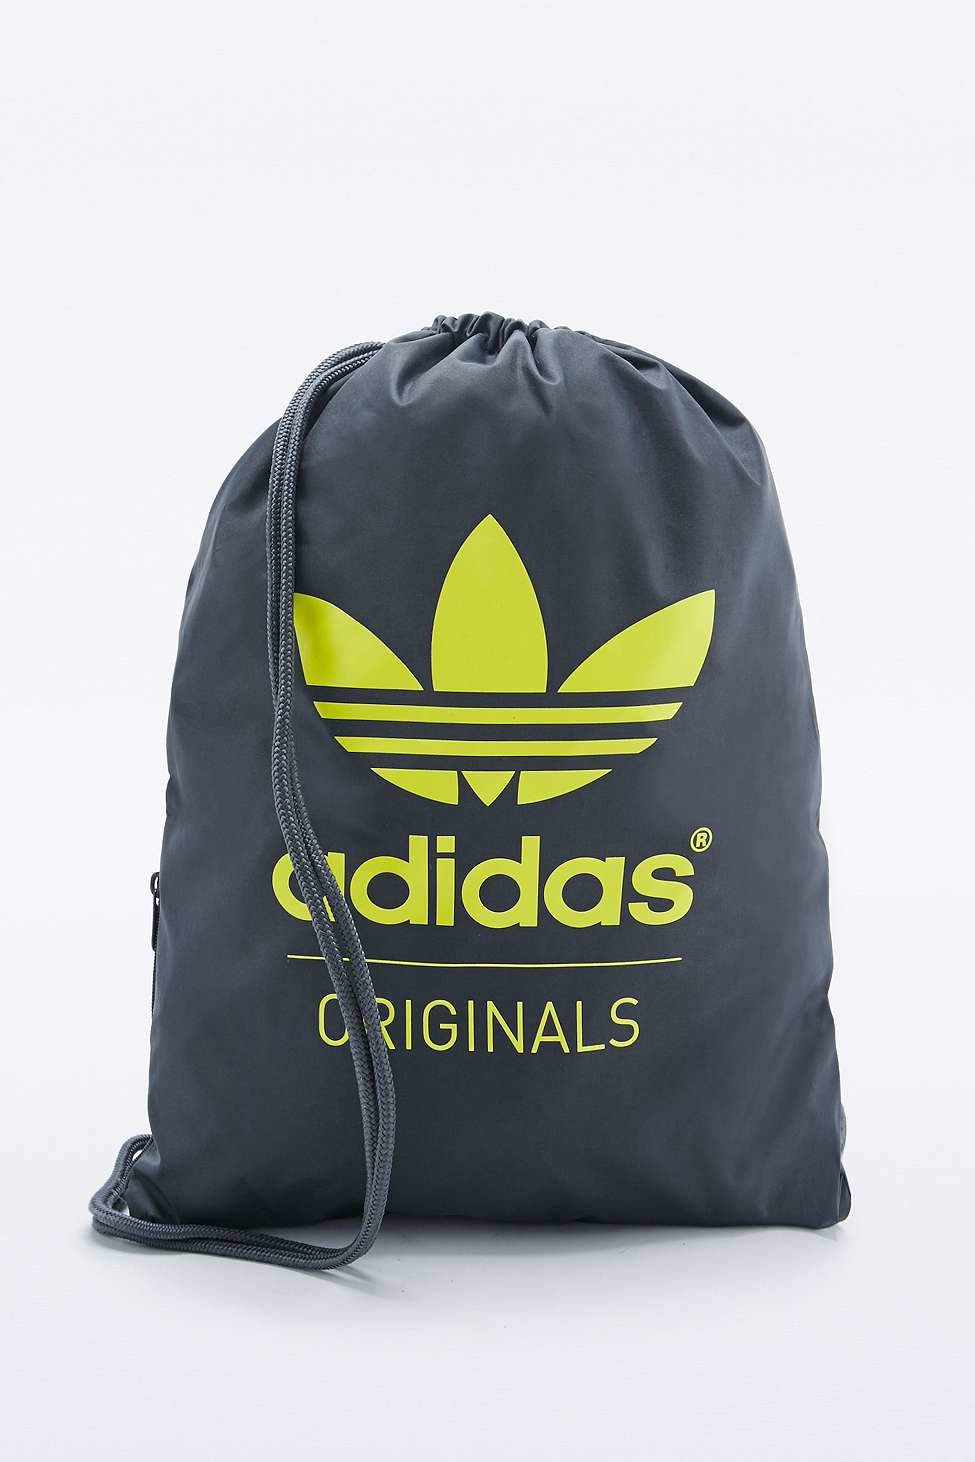 Adidas Originals Grey Drawstring Bag In Gray For Men Lyst